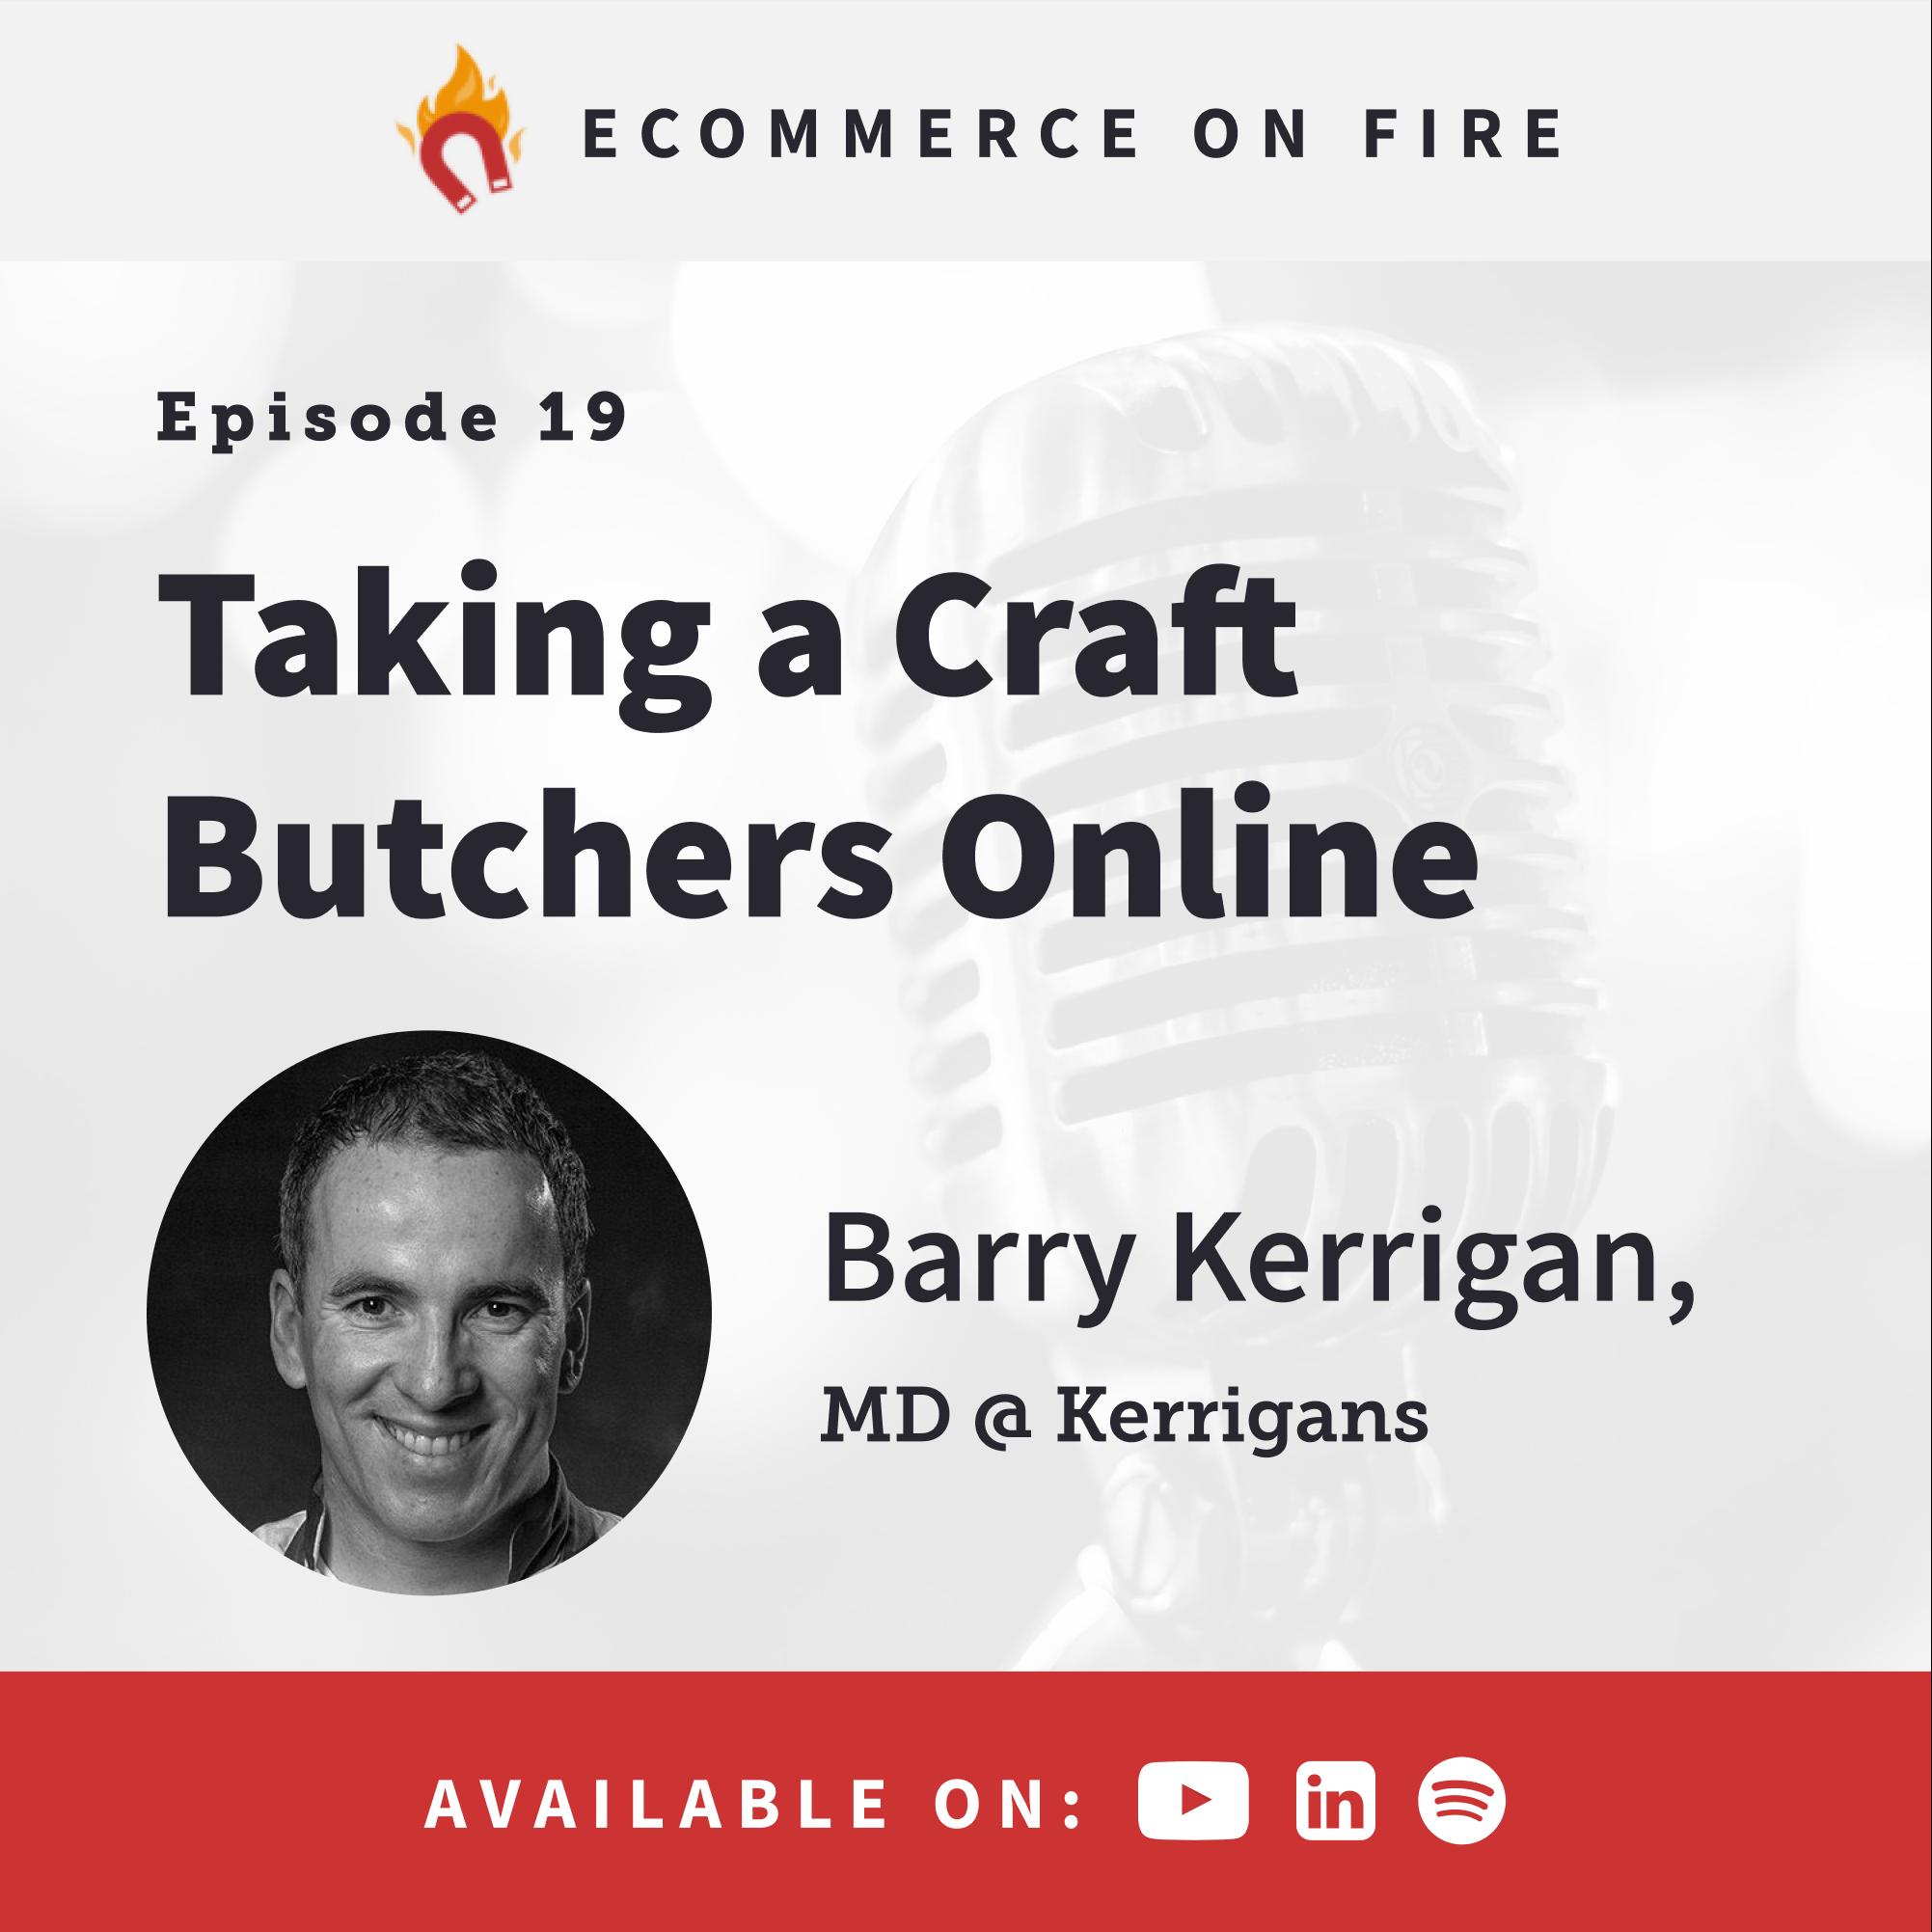 Taking a butchery online - with Barry Kerrigan, MD & Kerrigans